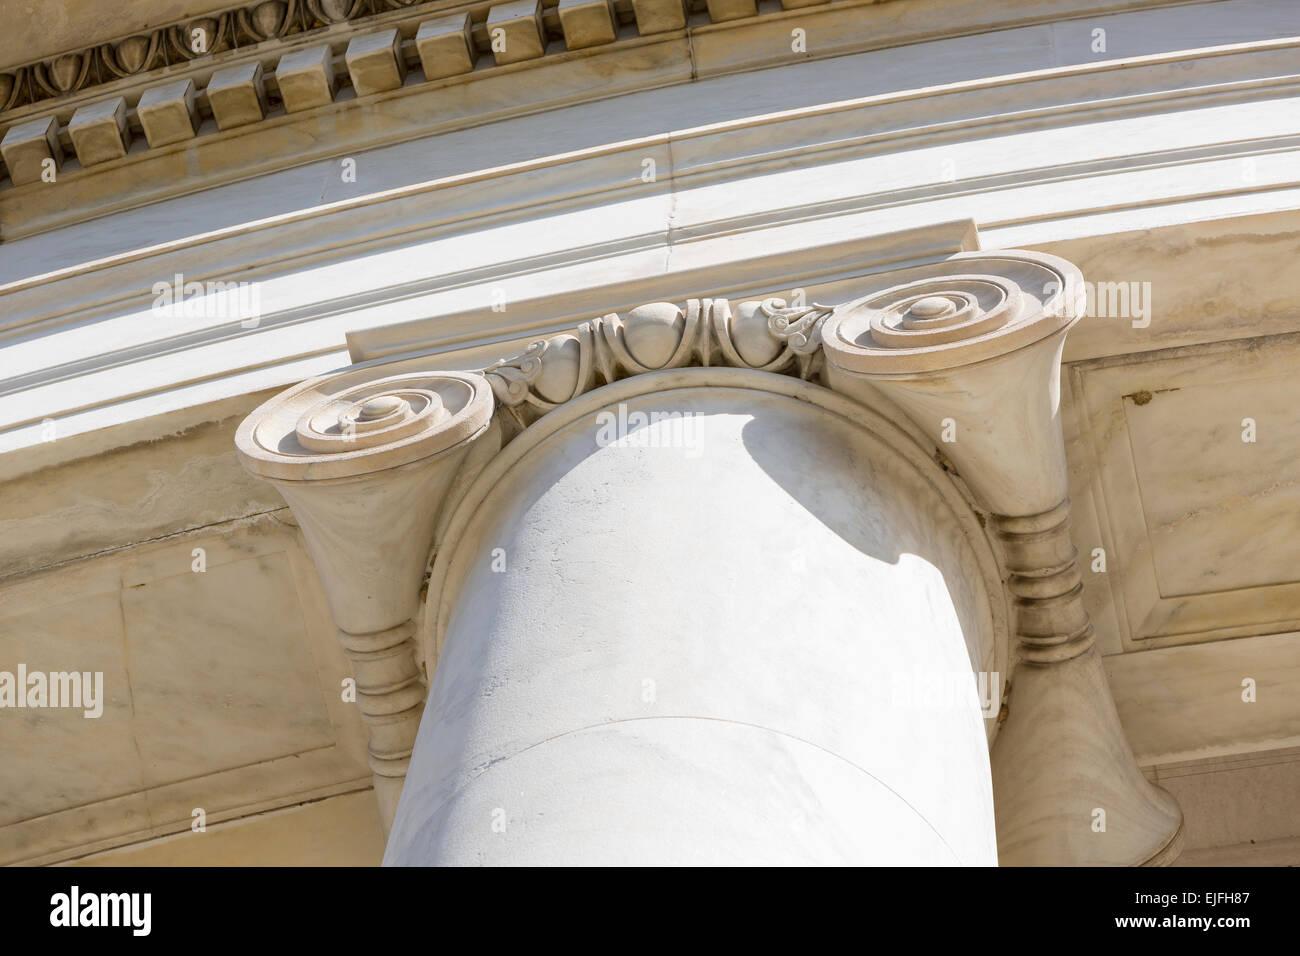 Ionic column stock photos images alamy